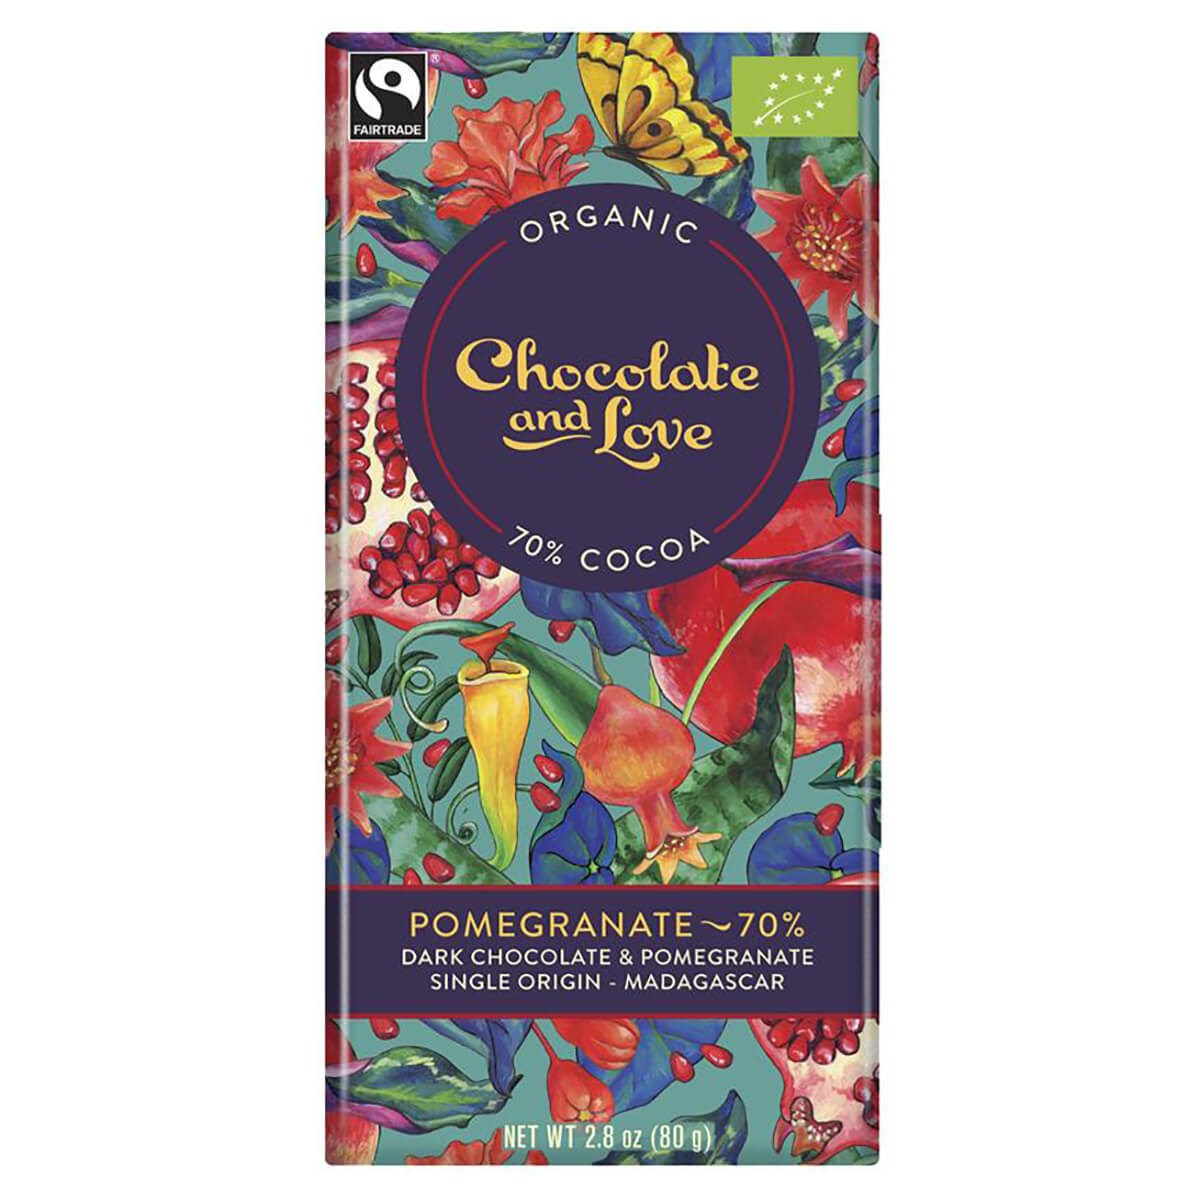 Chocolate and Love Organic & Fairtrade 70% Dark Chocolate with Pomegranate